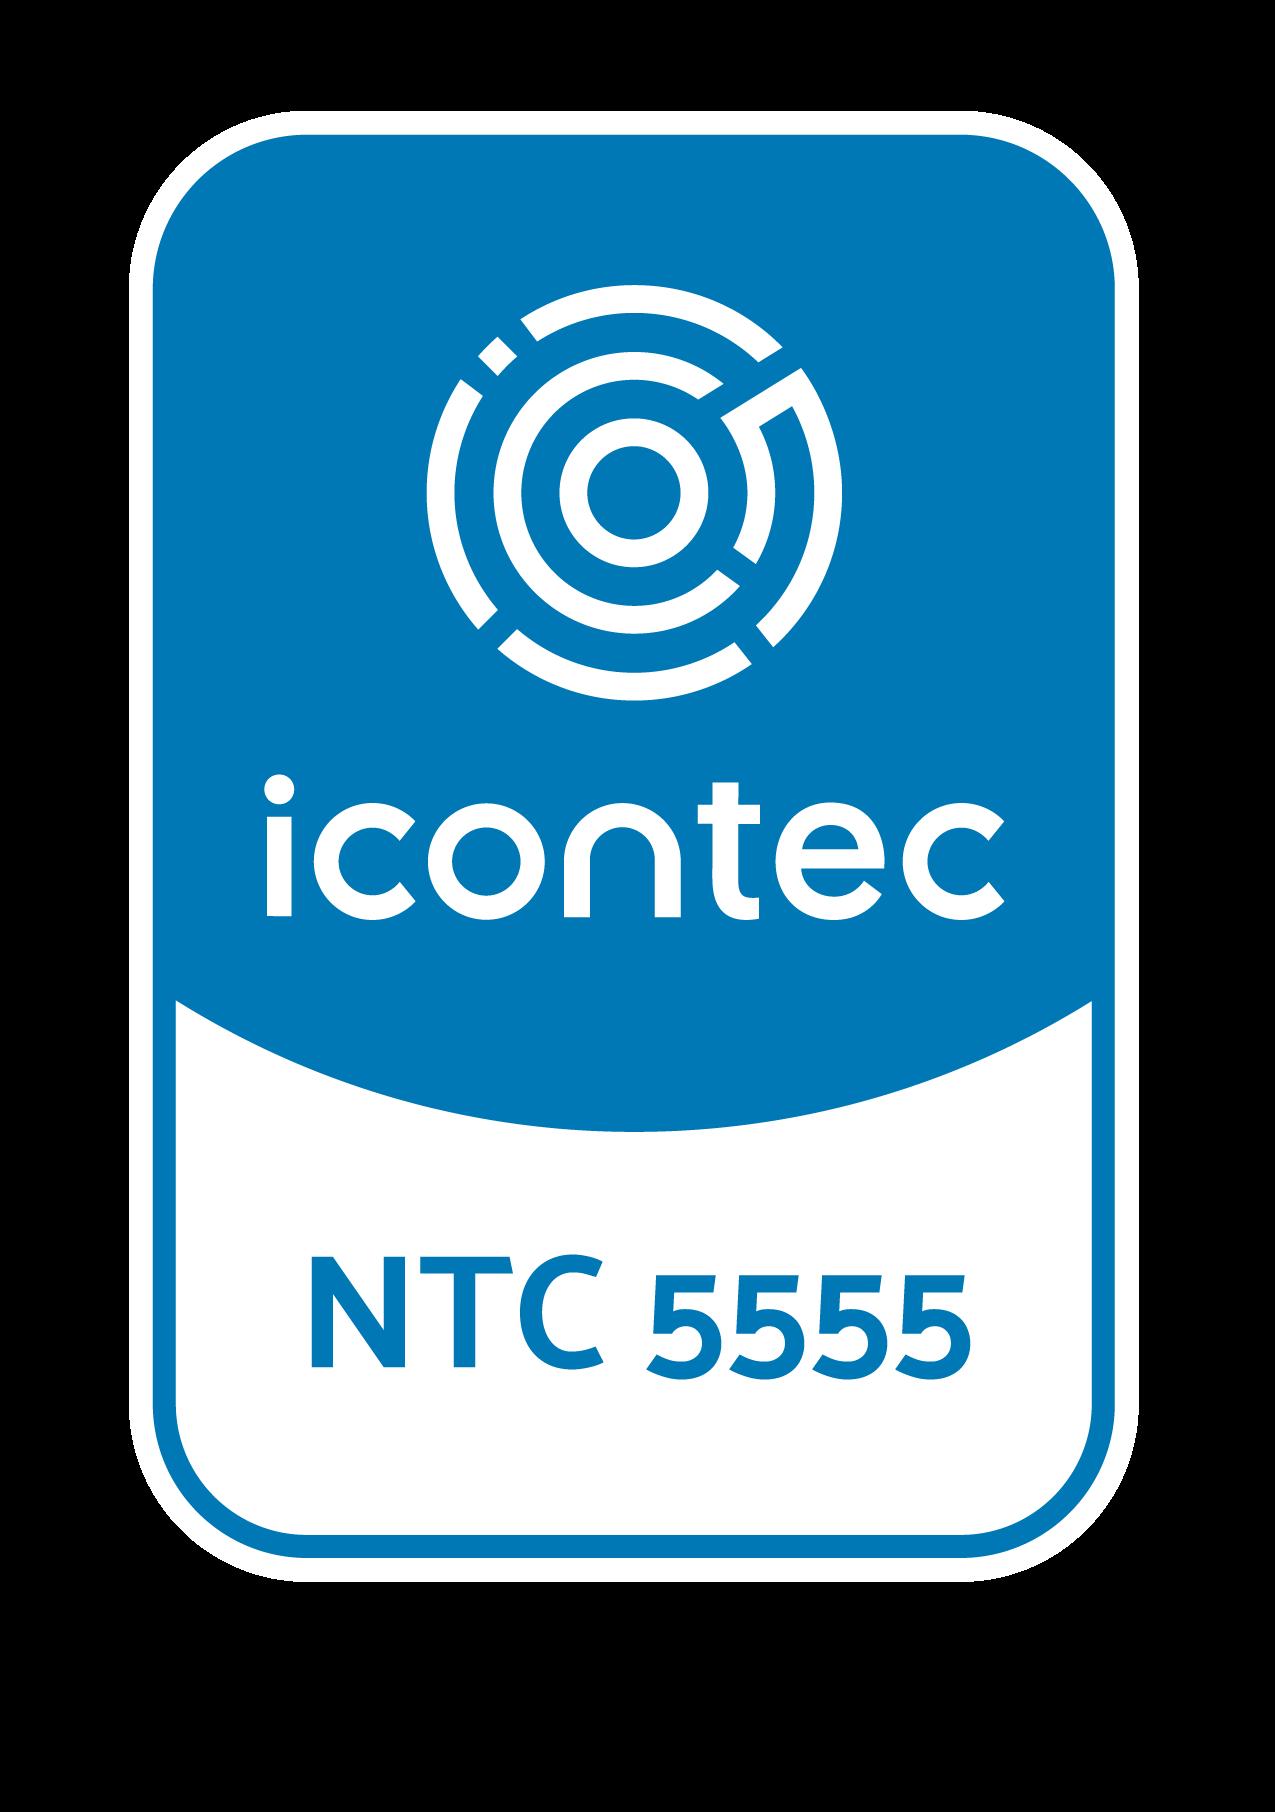 logos icontec-02